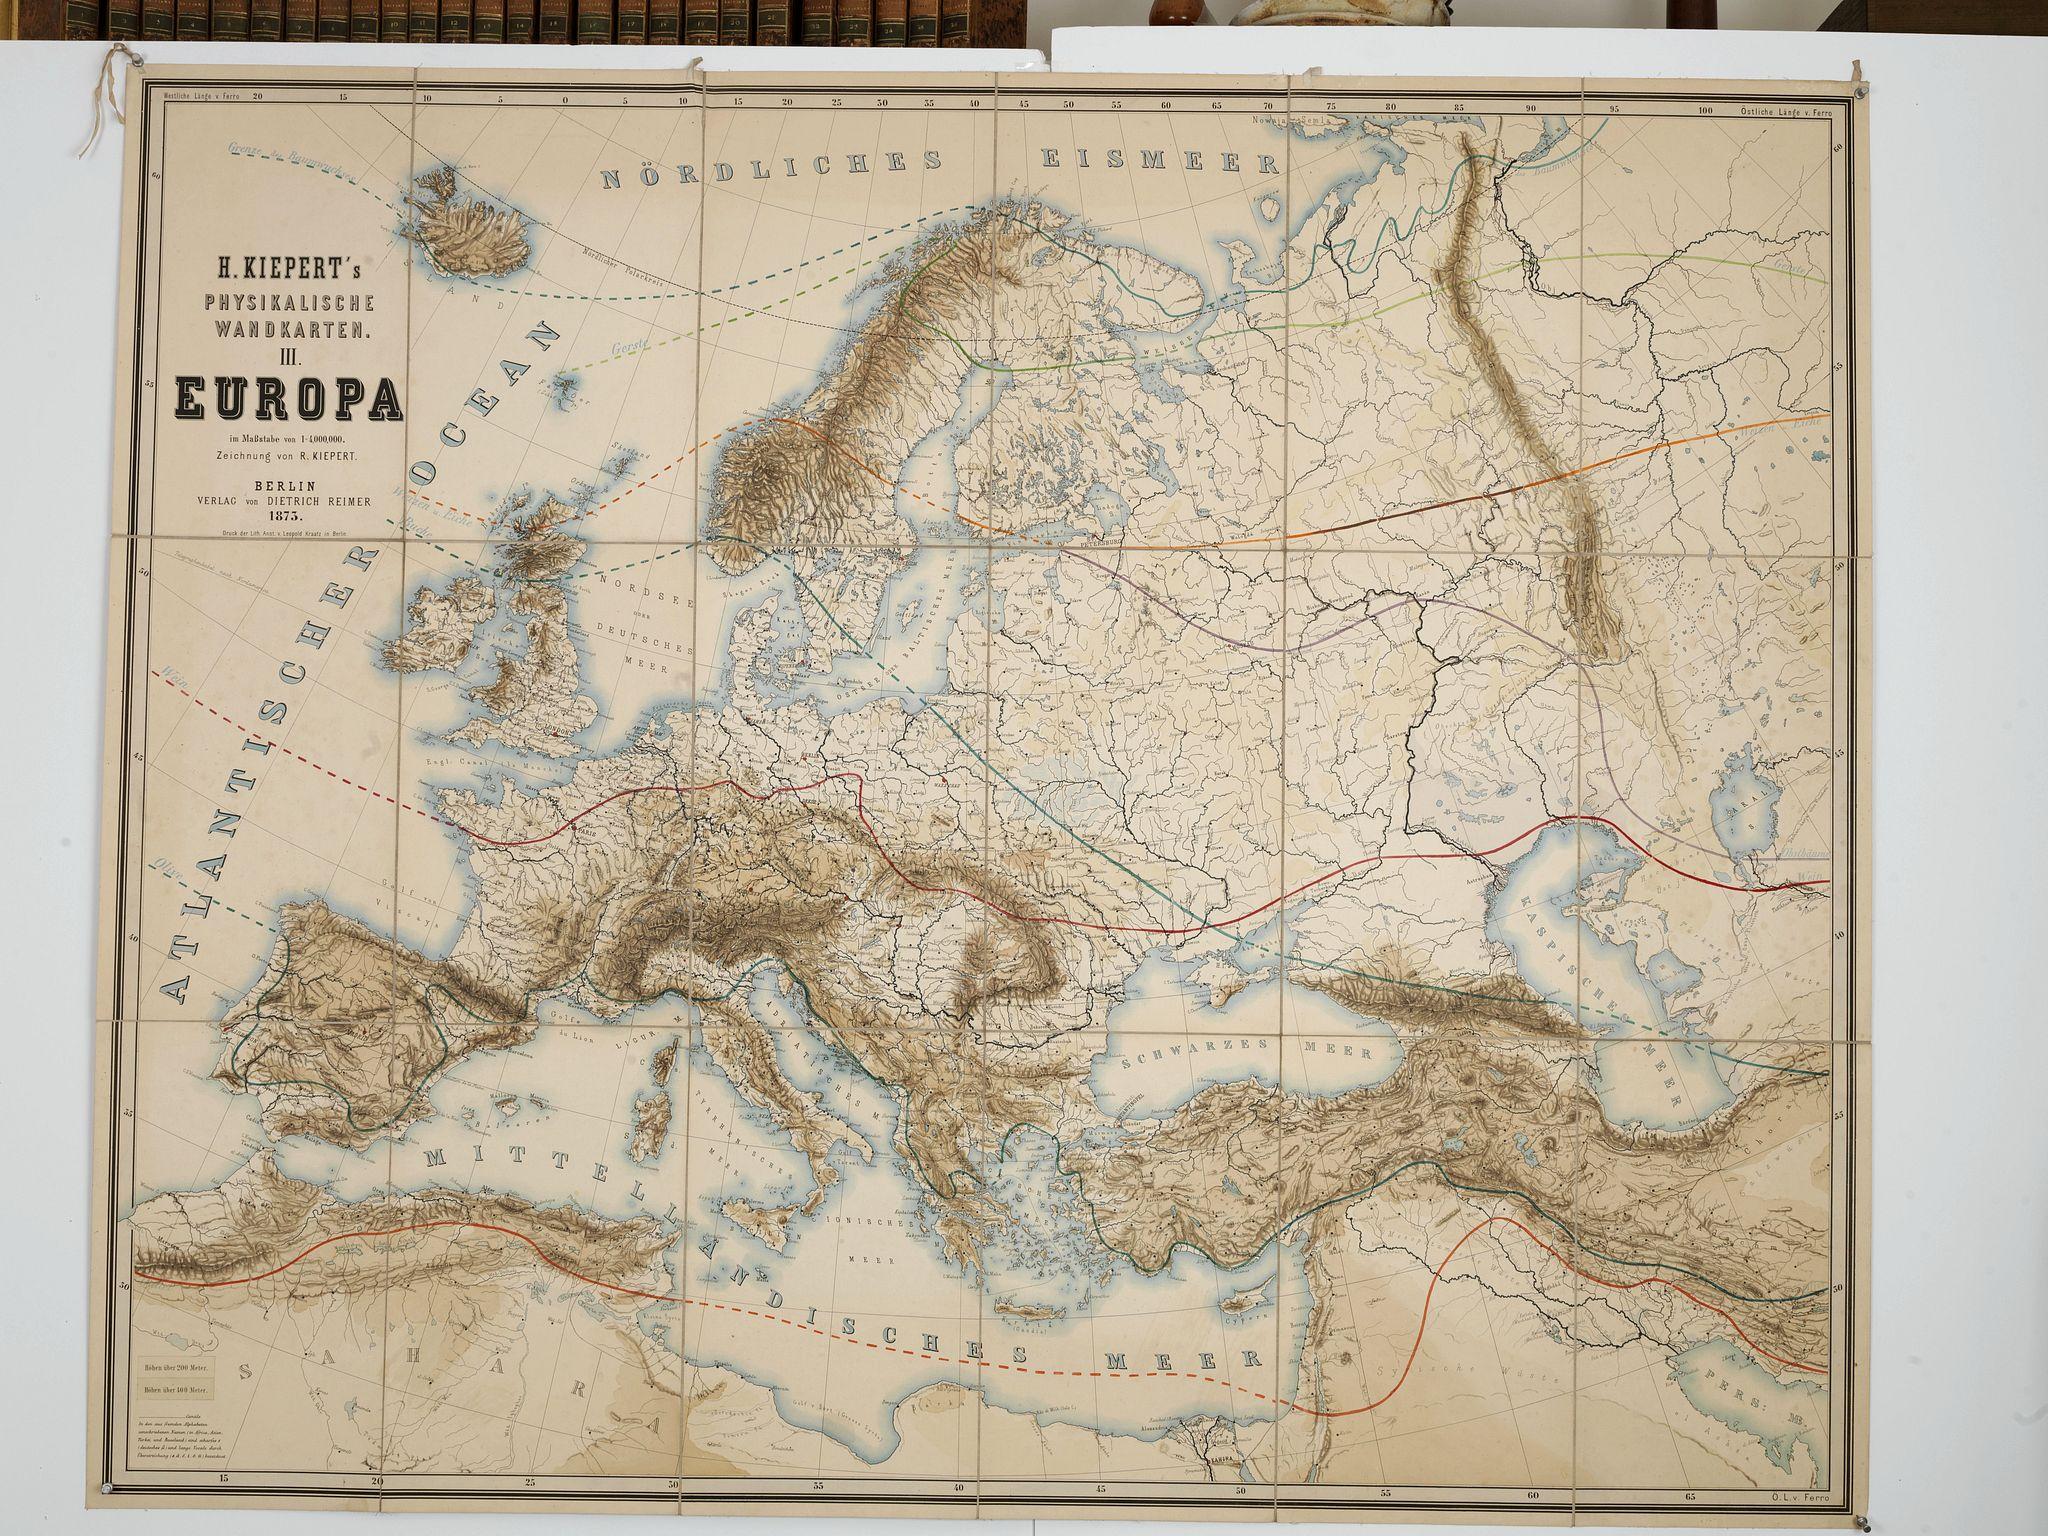 KIEPERT, H. -  Physikalische Wandkarten III. Europe. . .